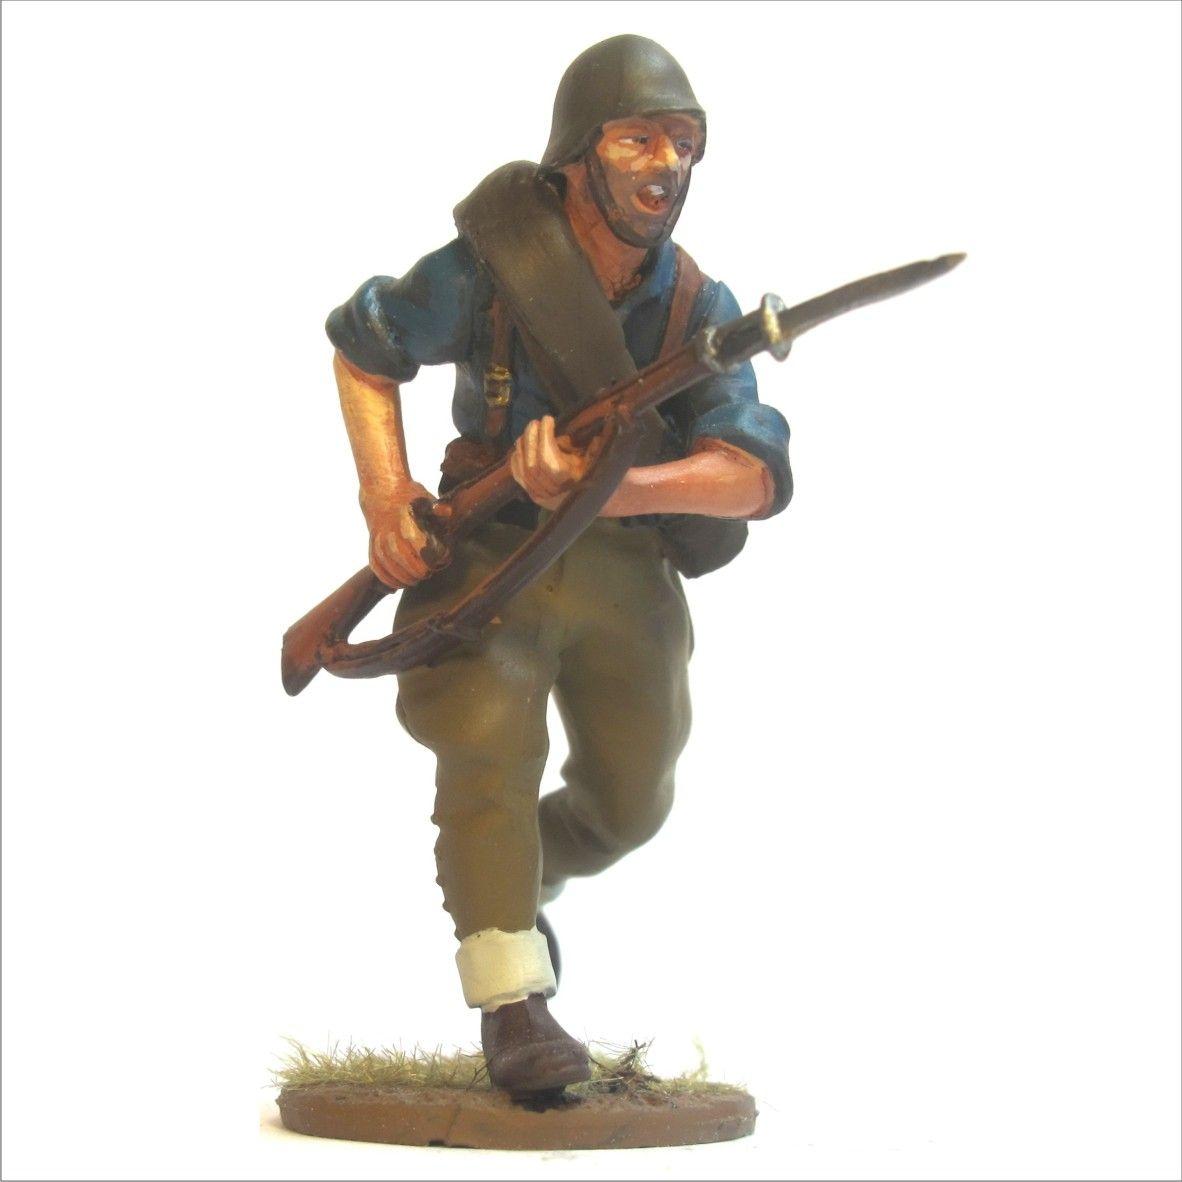 SCW 006 Falange militiaman running helmet | Helmets, Civil wars and ...